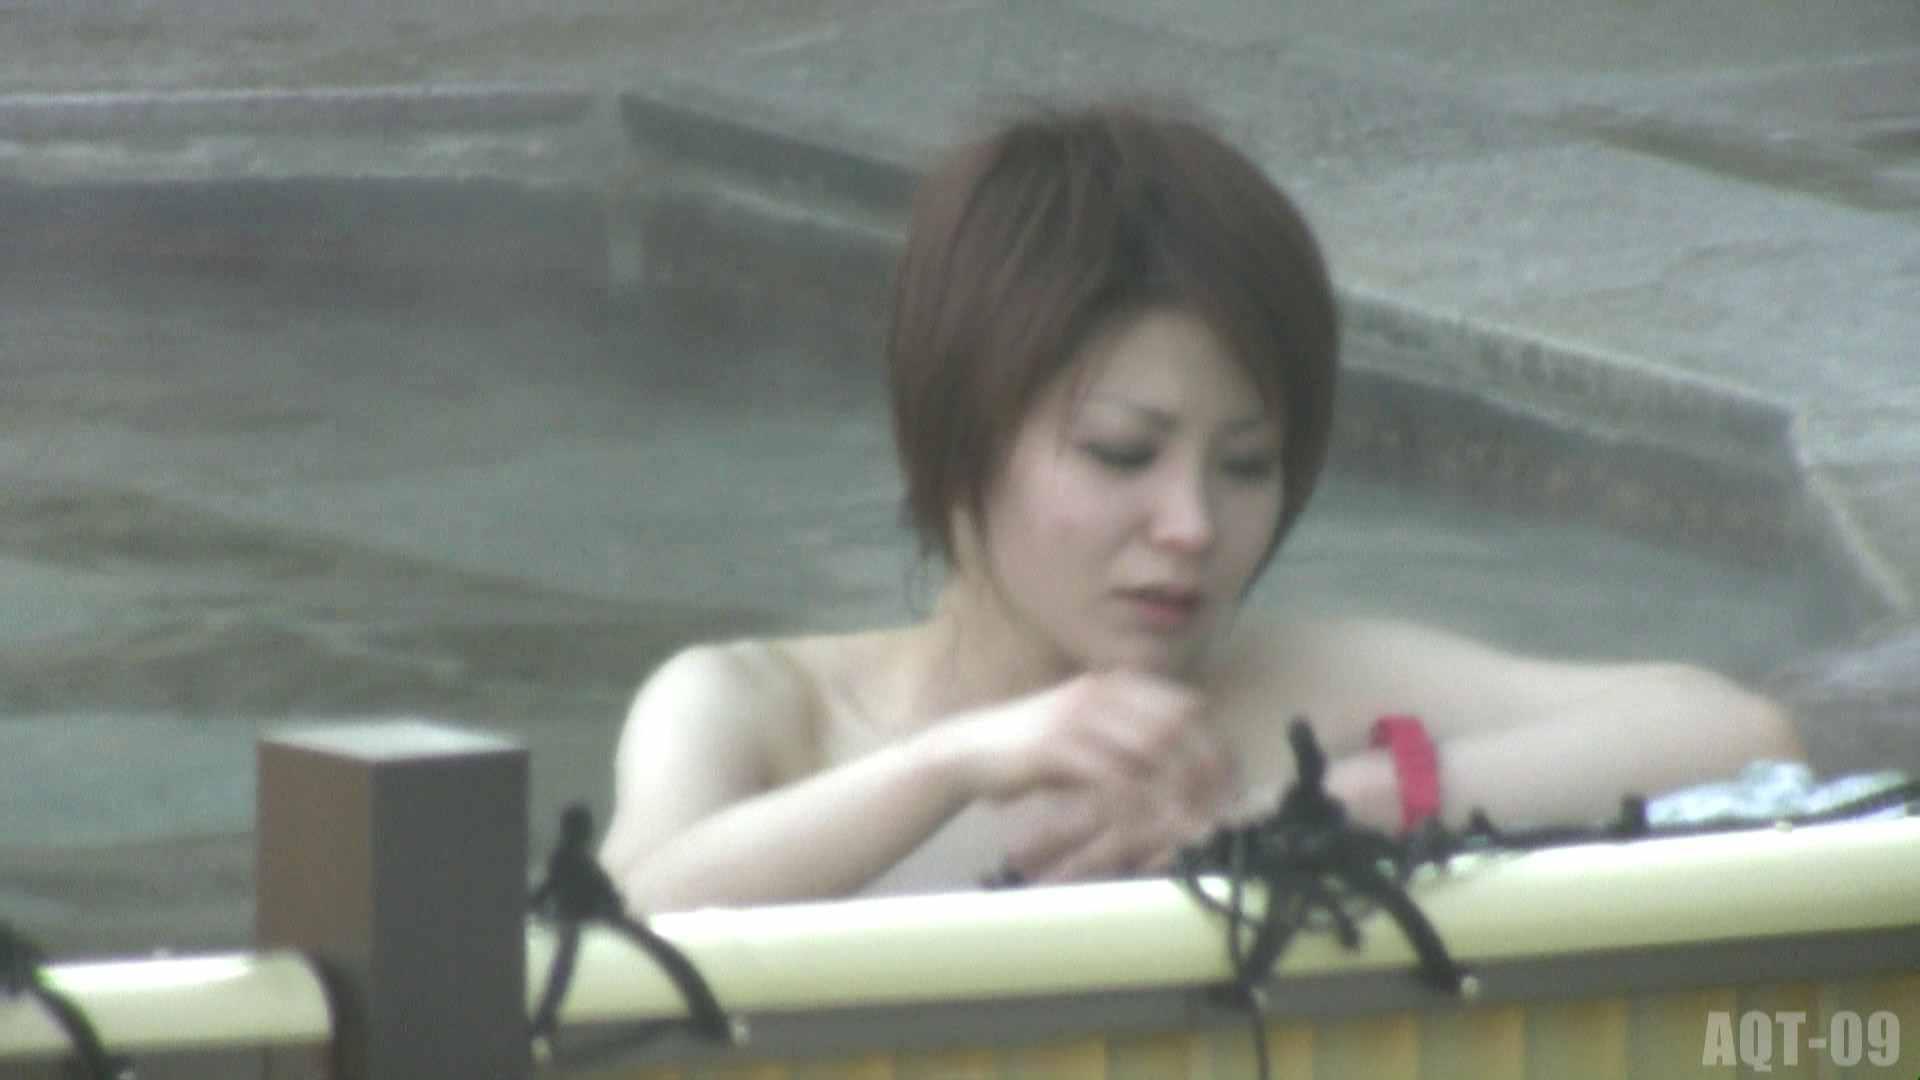 Aquaな露天風呂Vol.779 OLセックス 覗きおまんこ画像 107画像 62